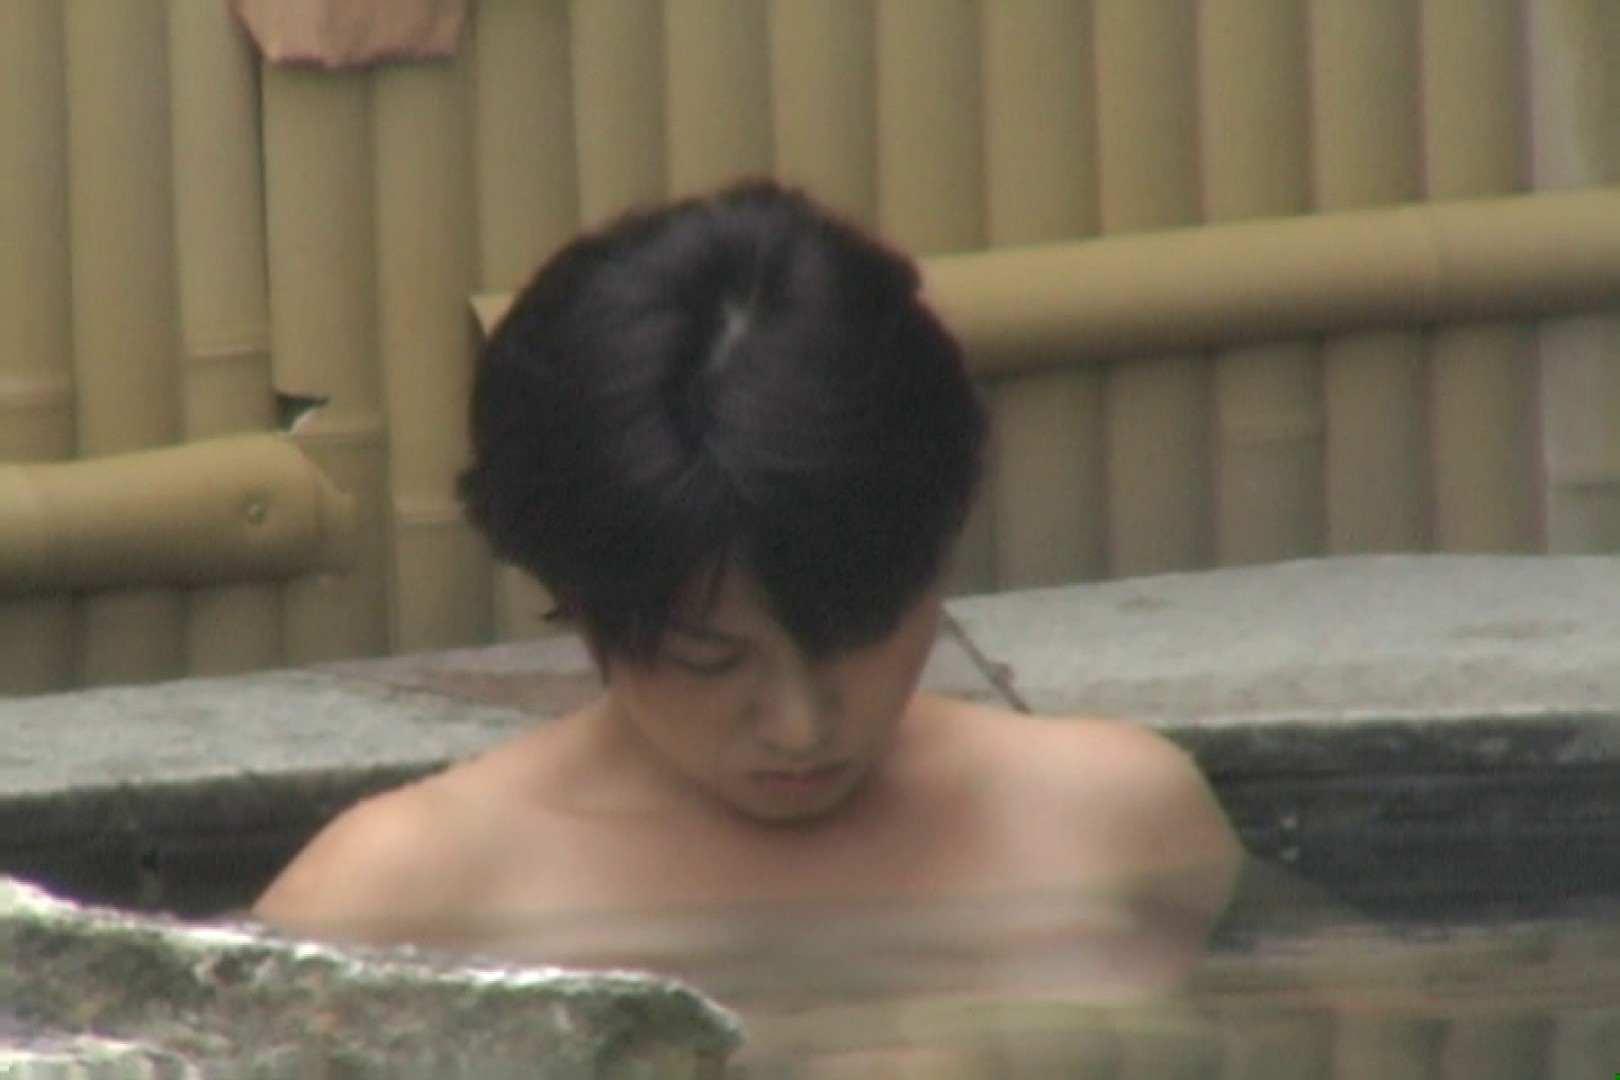 Aquaな露天風呂Vol.624 盗撮 隠し撮りオマンコ動画紹介 52画像 41